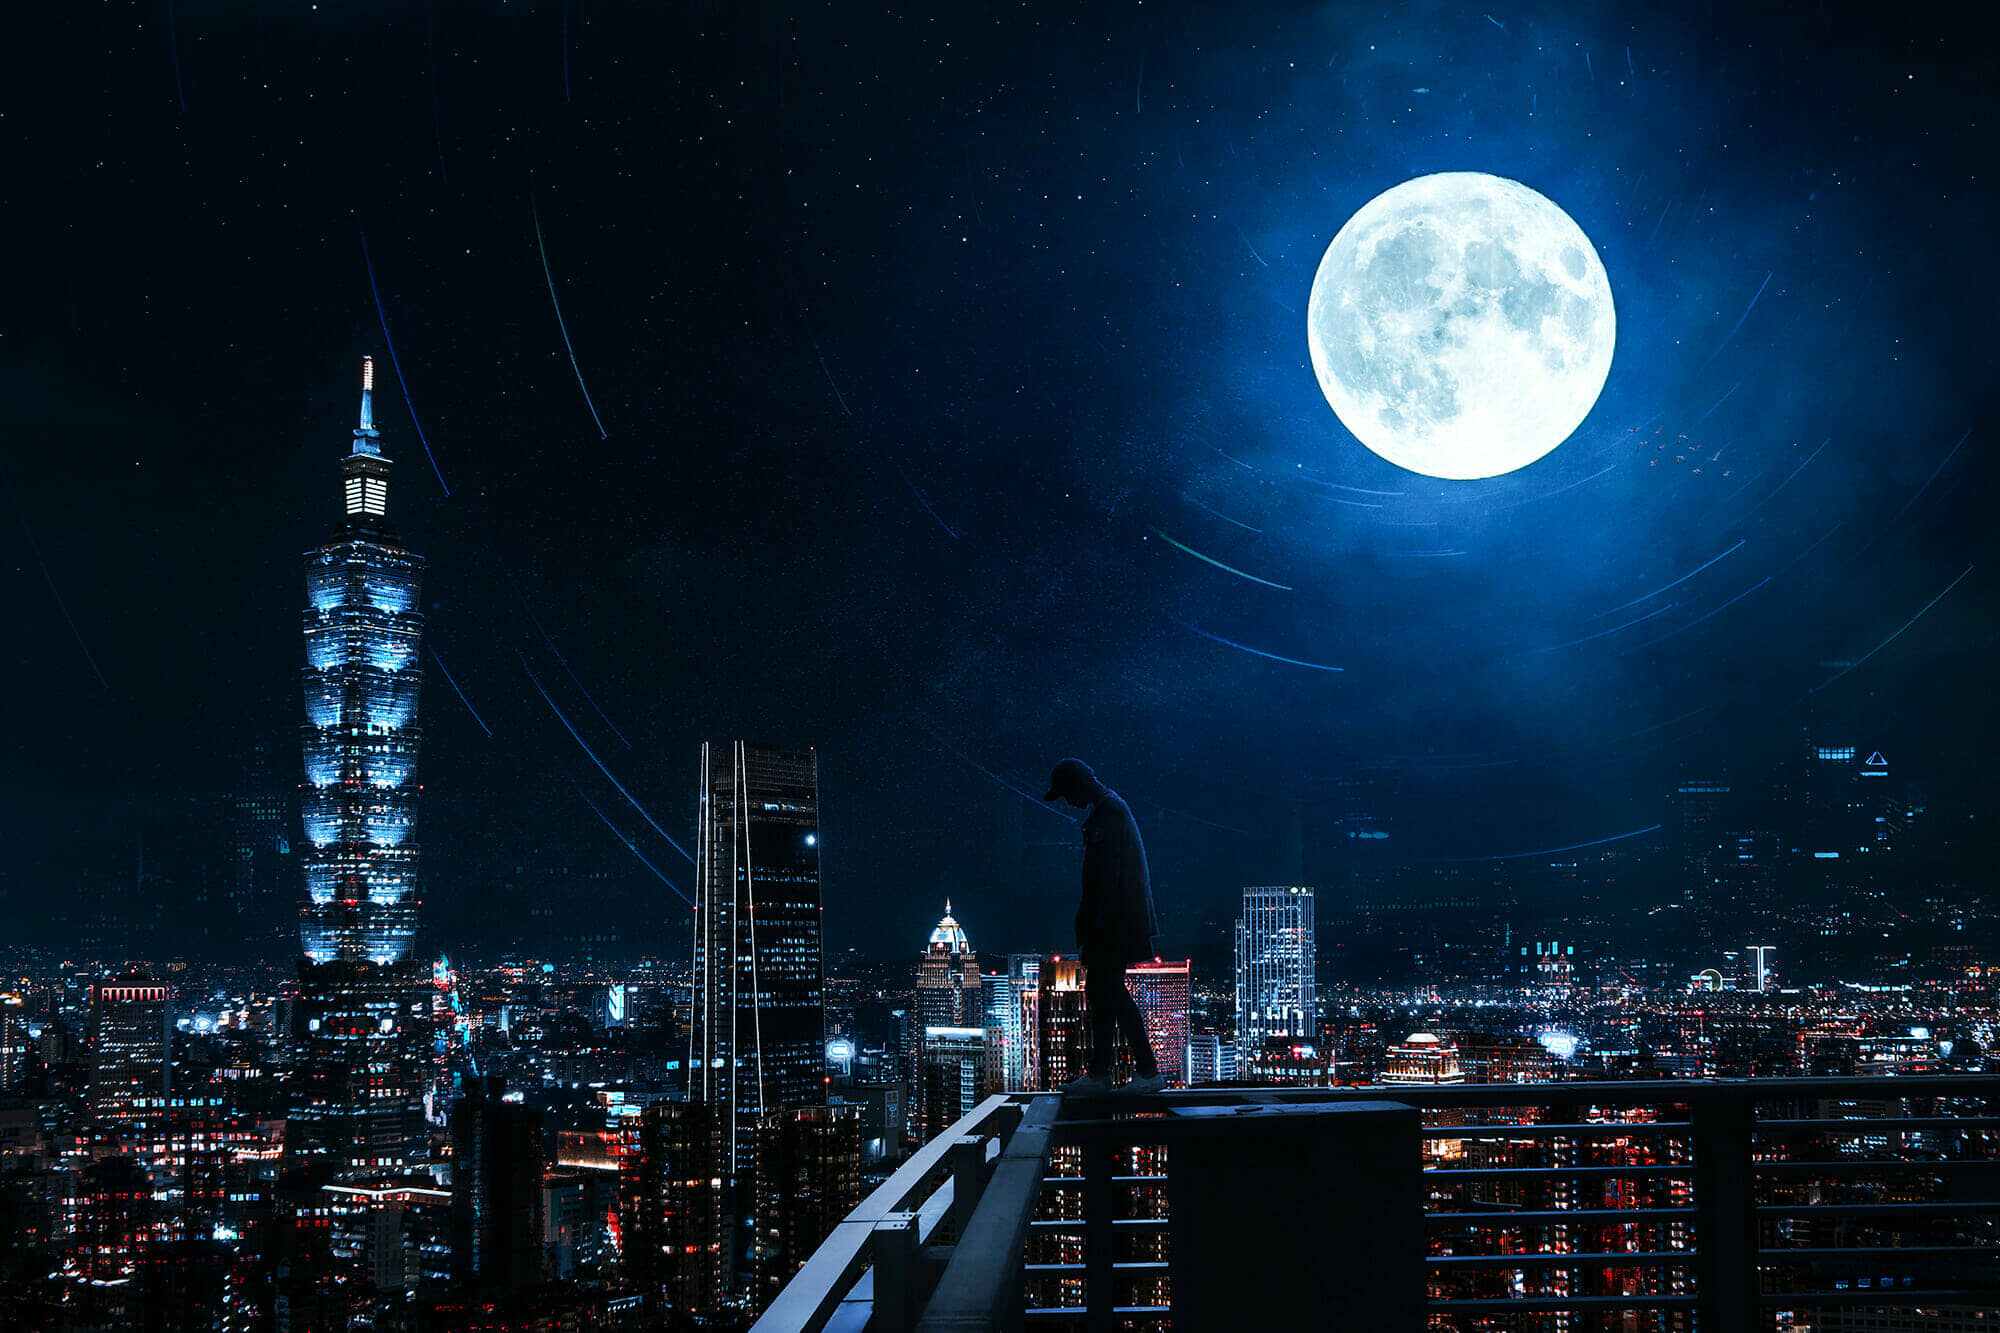 Create an Urban Rooftop Scene in Photoshop